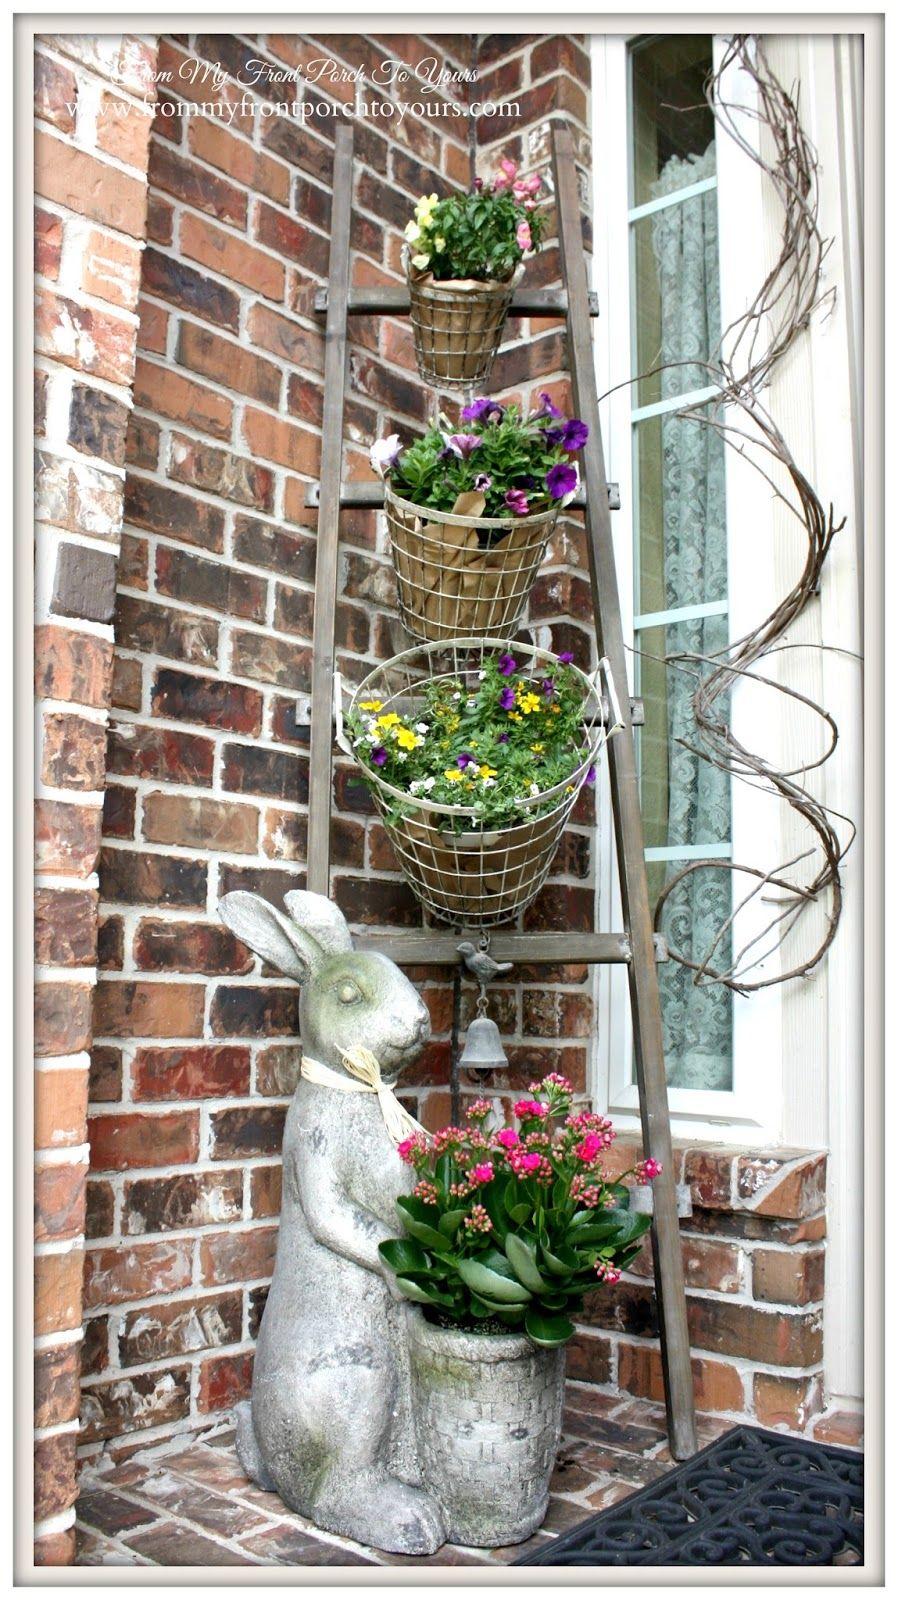 Decor steals design ingenuity event vintage farmhouse wire baskets